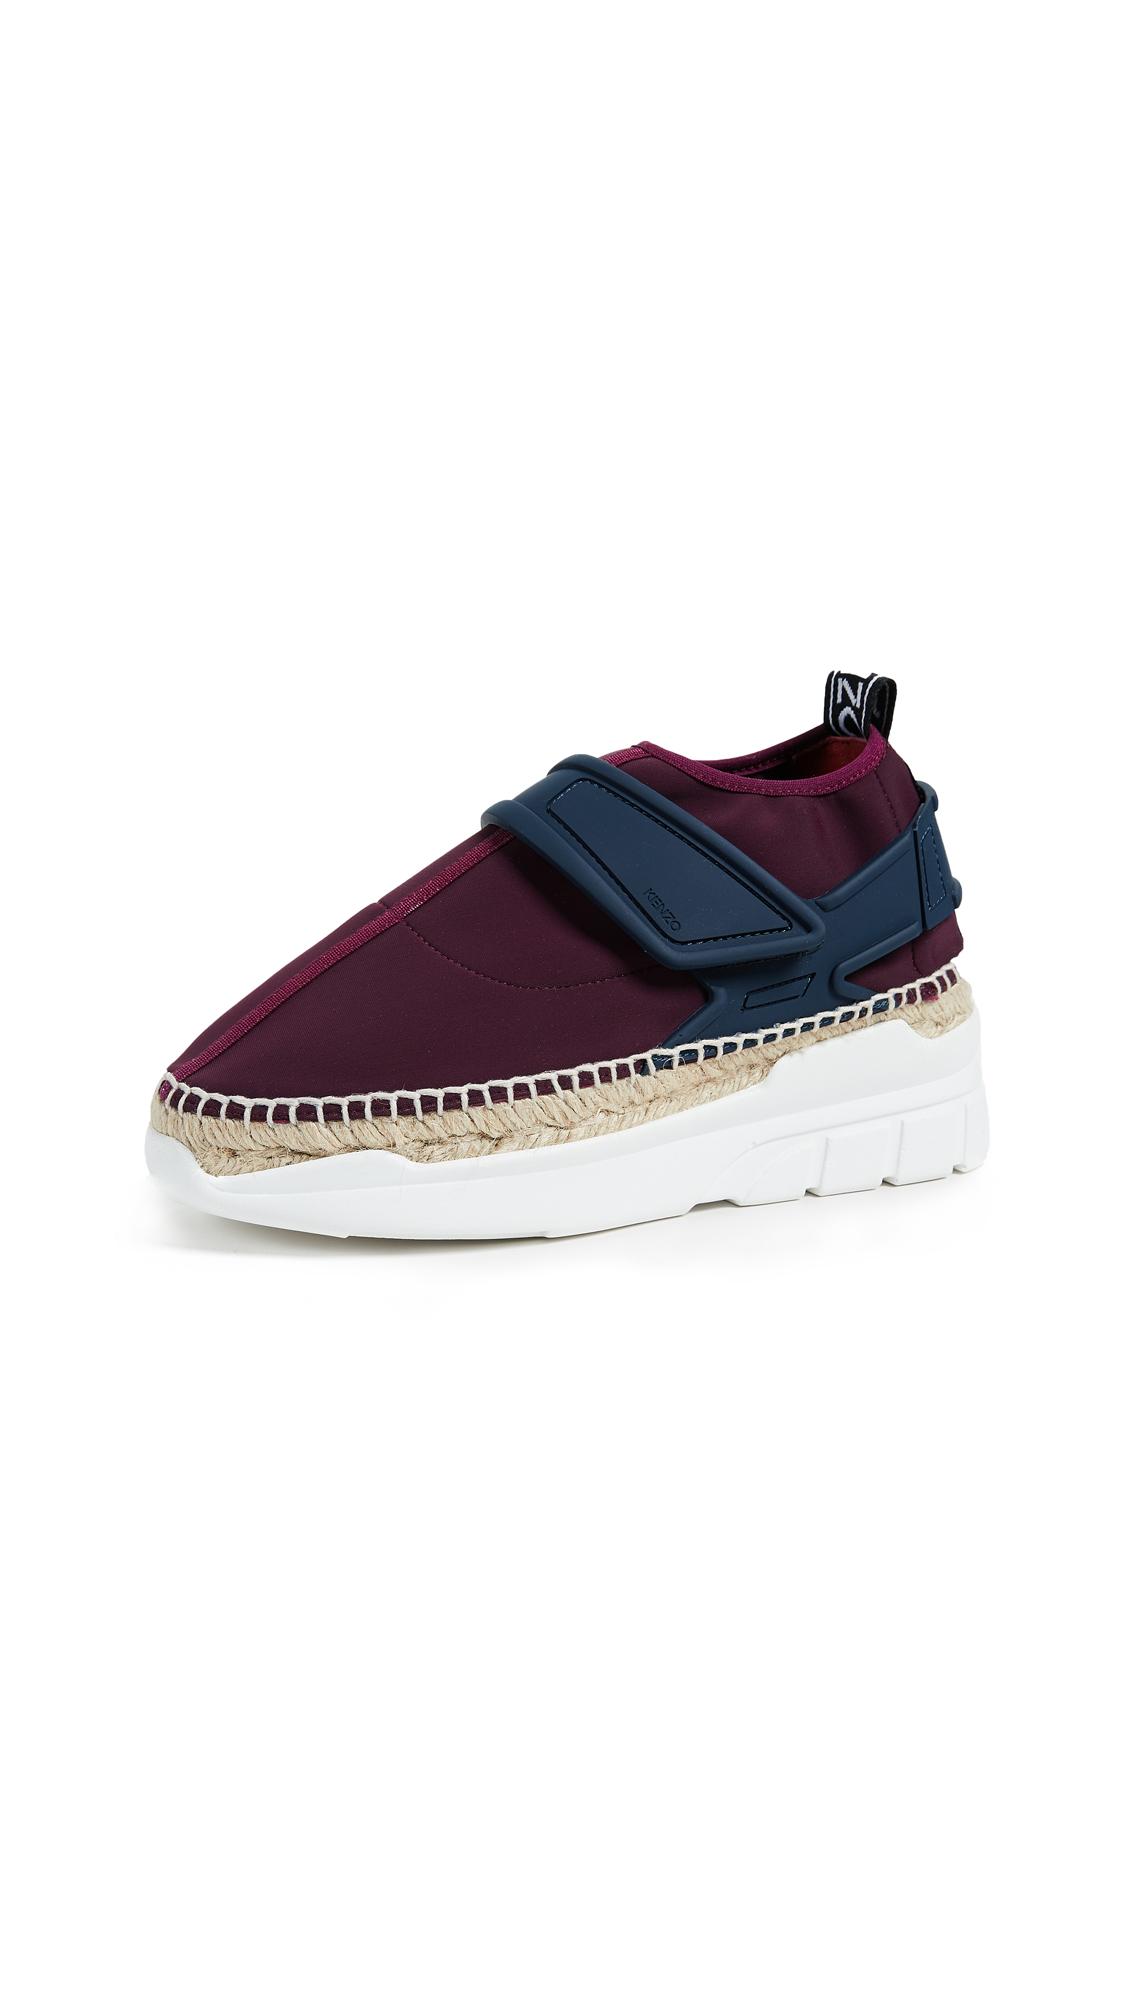 KENZO K Lastic Espadrille Sneakers - Bordeaux